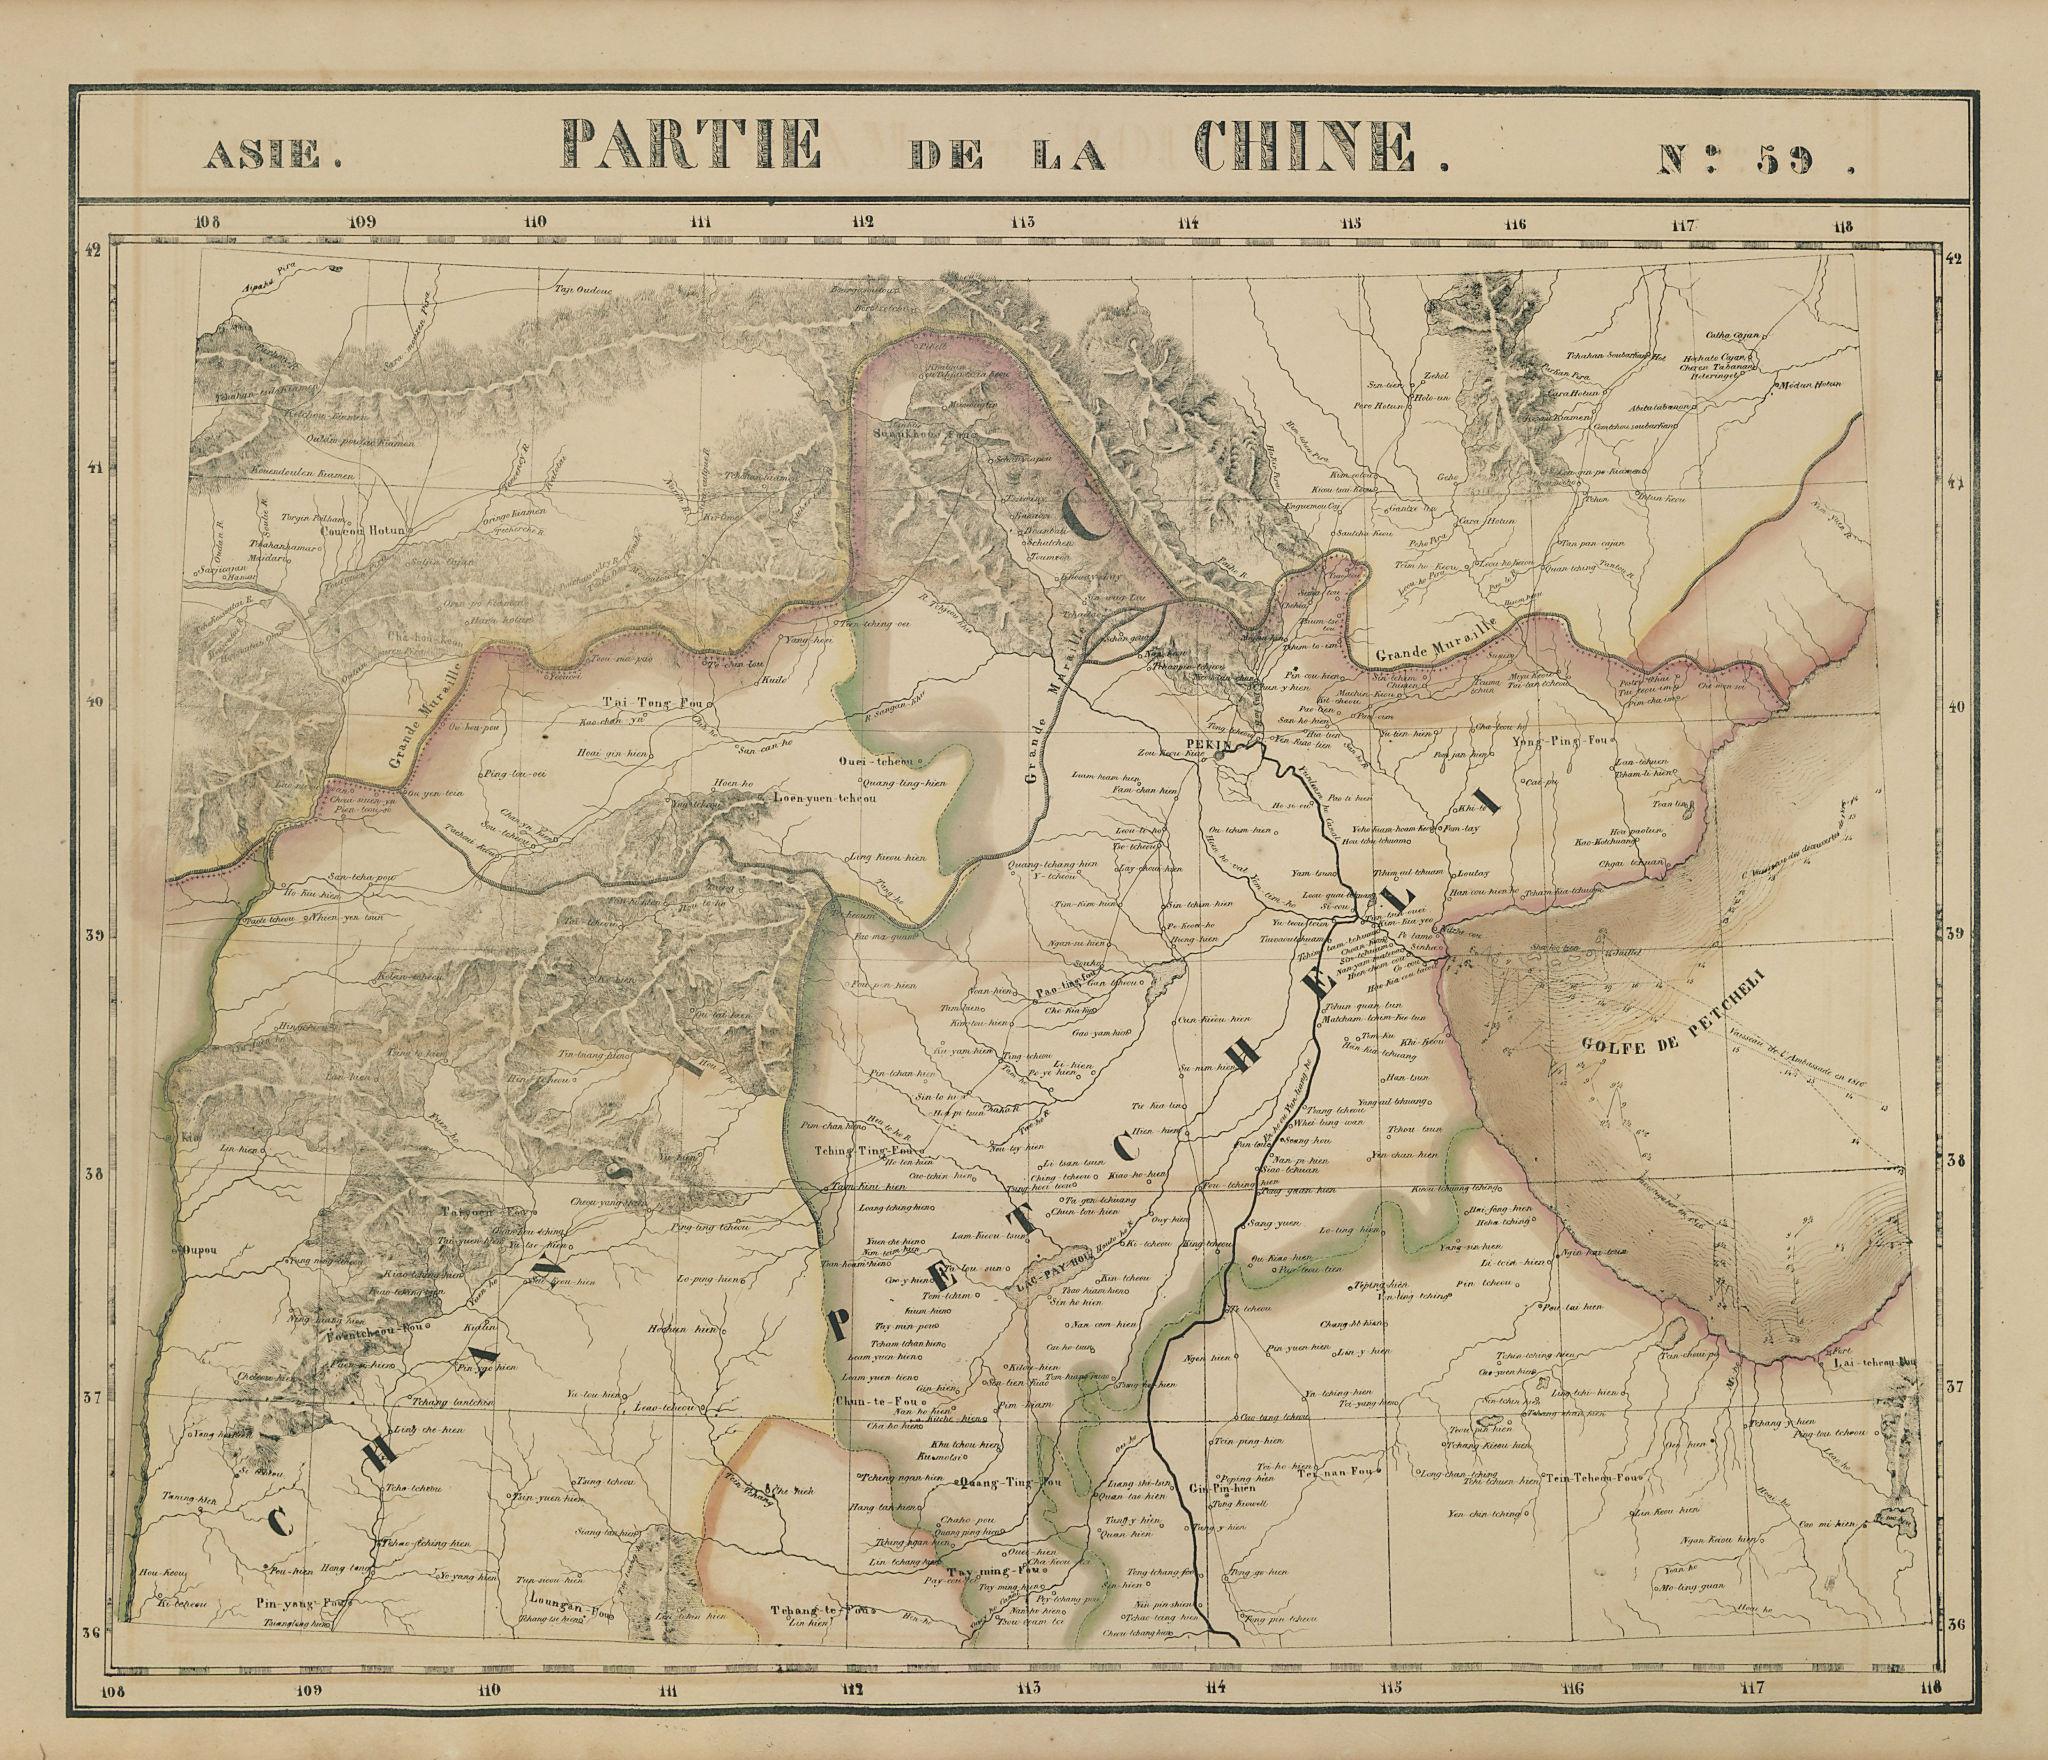 Asie. Partie de la Chine #59 China. Heibei Shanxi Beijing VANDERMAELEN 1827 map